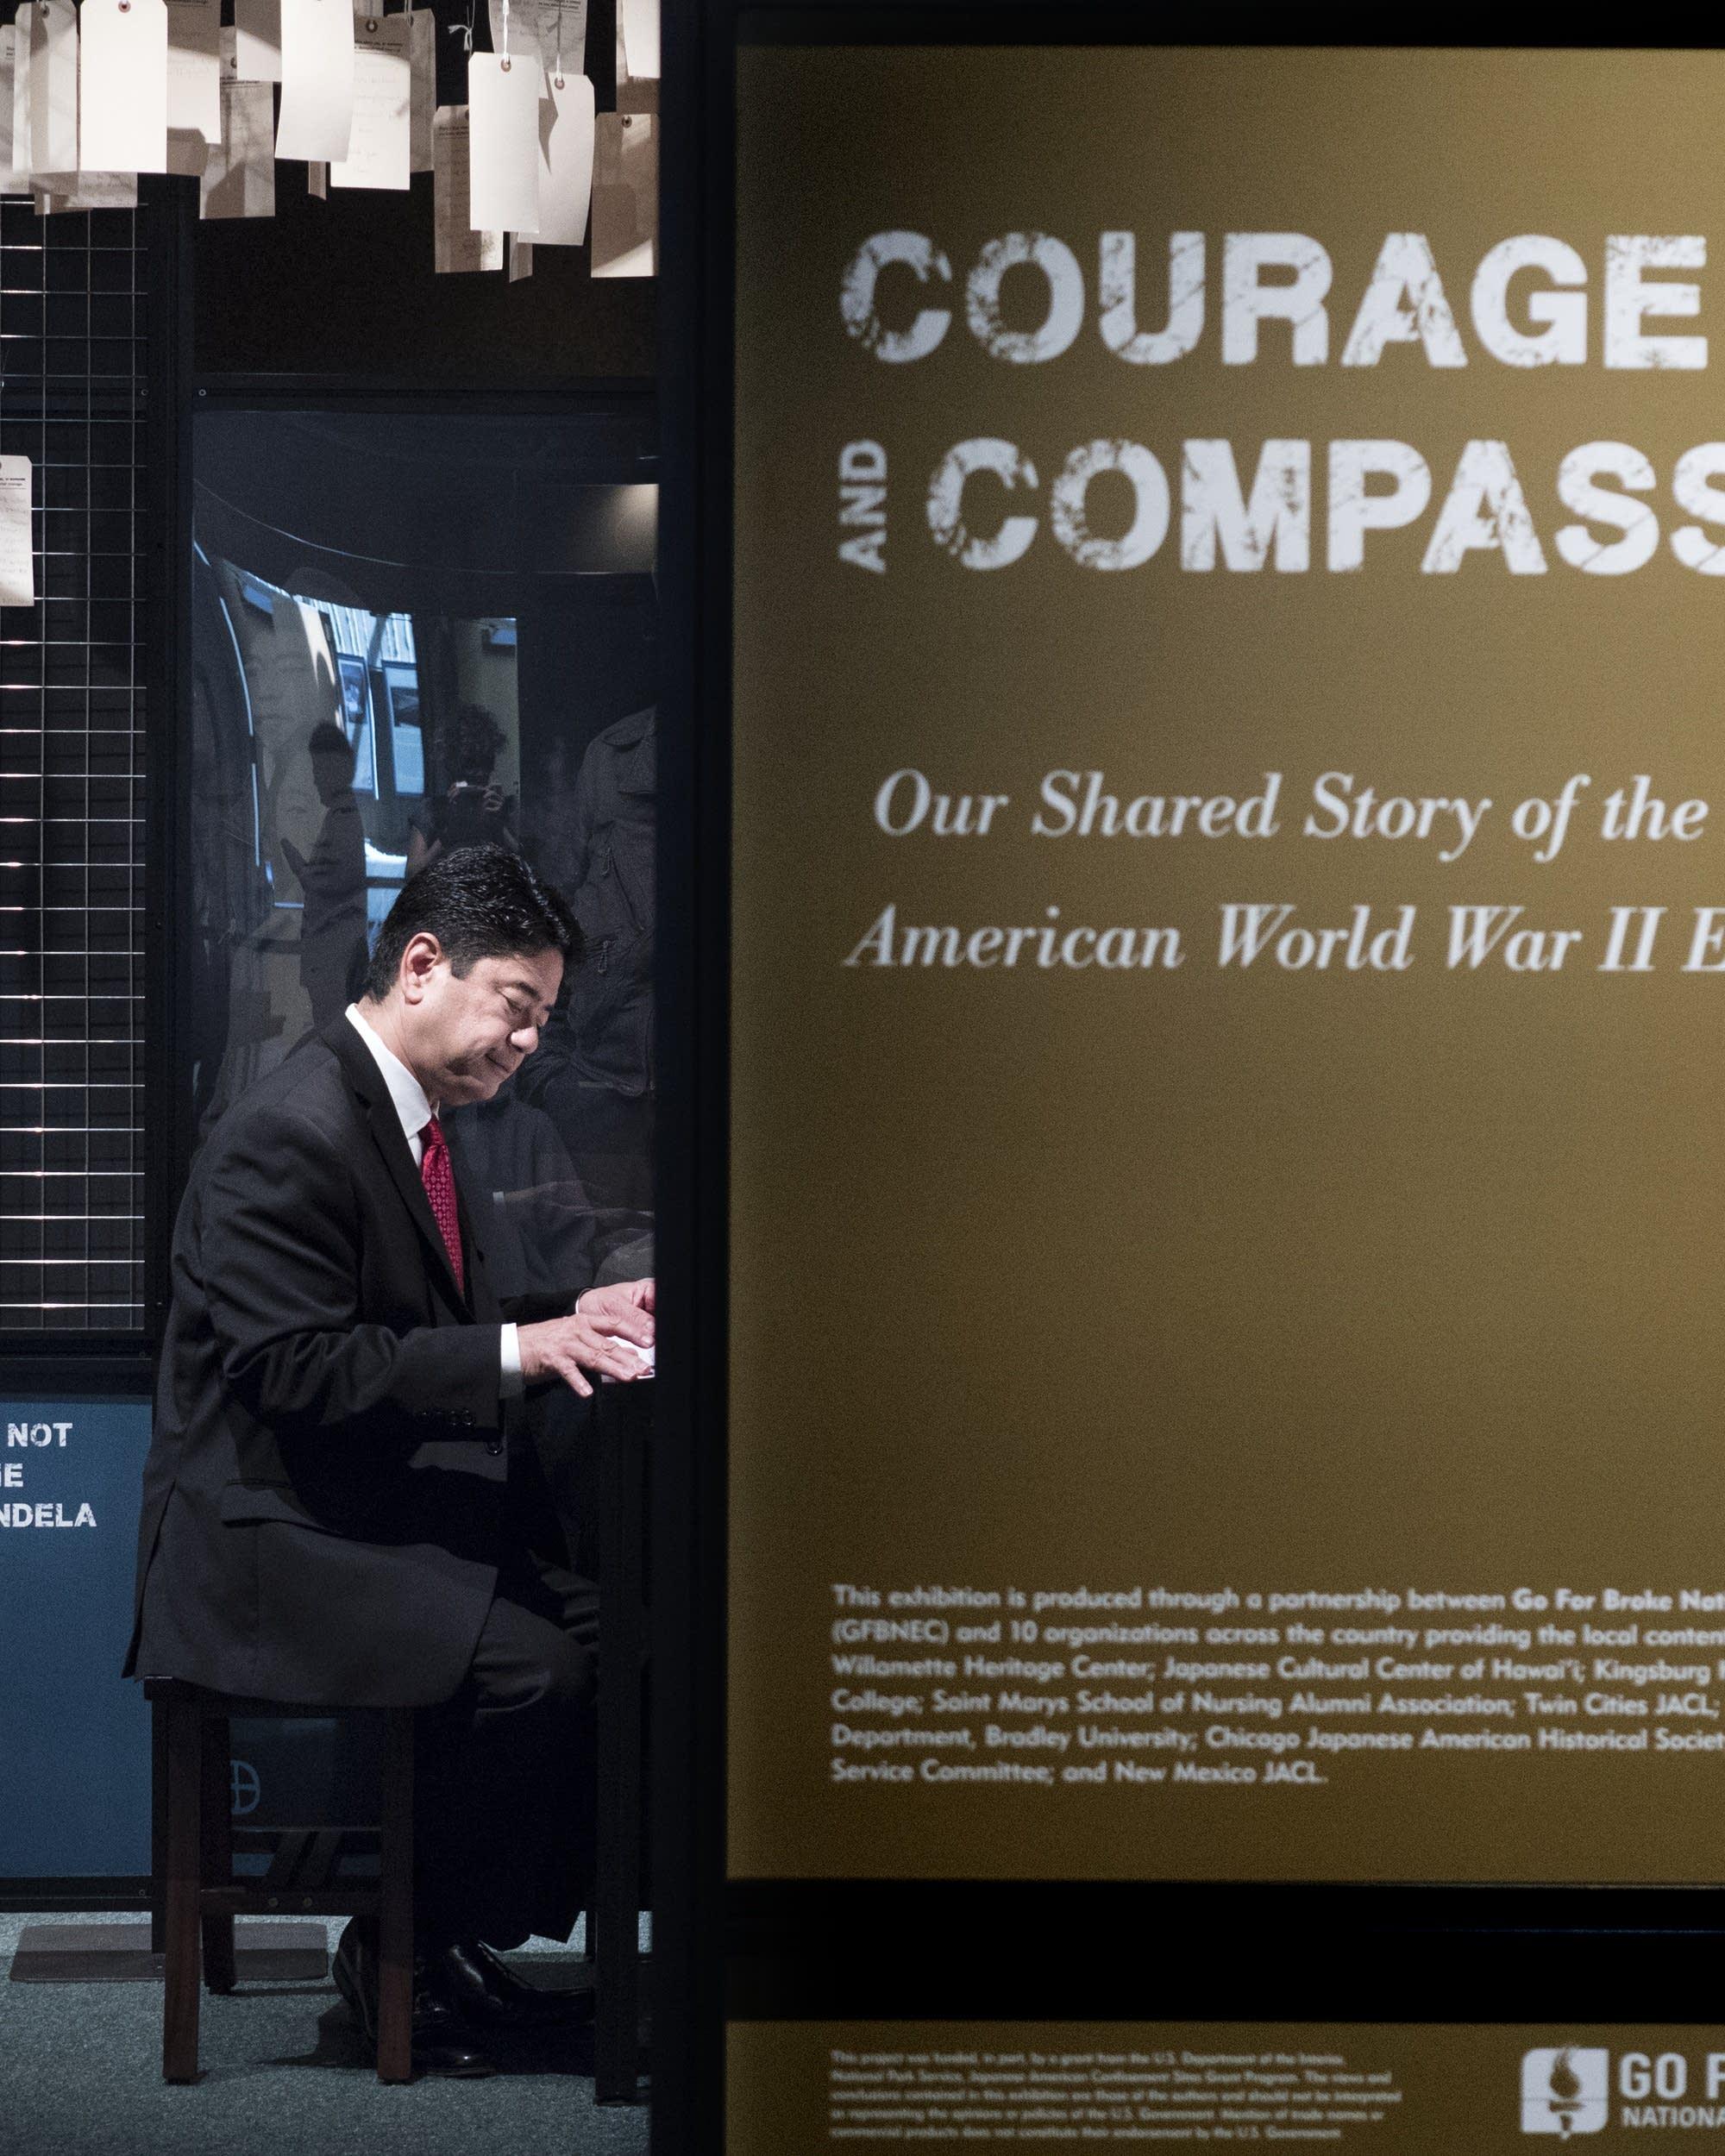 Exhibit recalls Japanese-American internment of WWII | MPR News